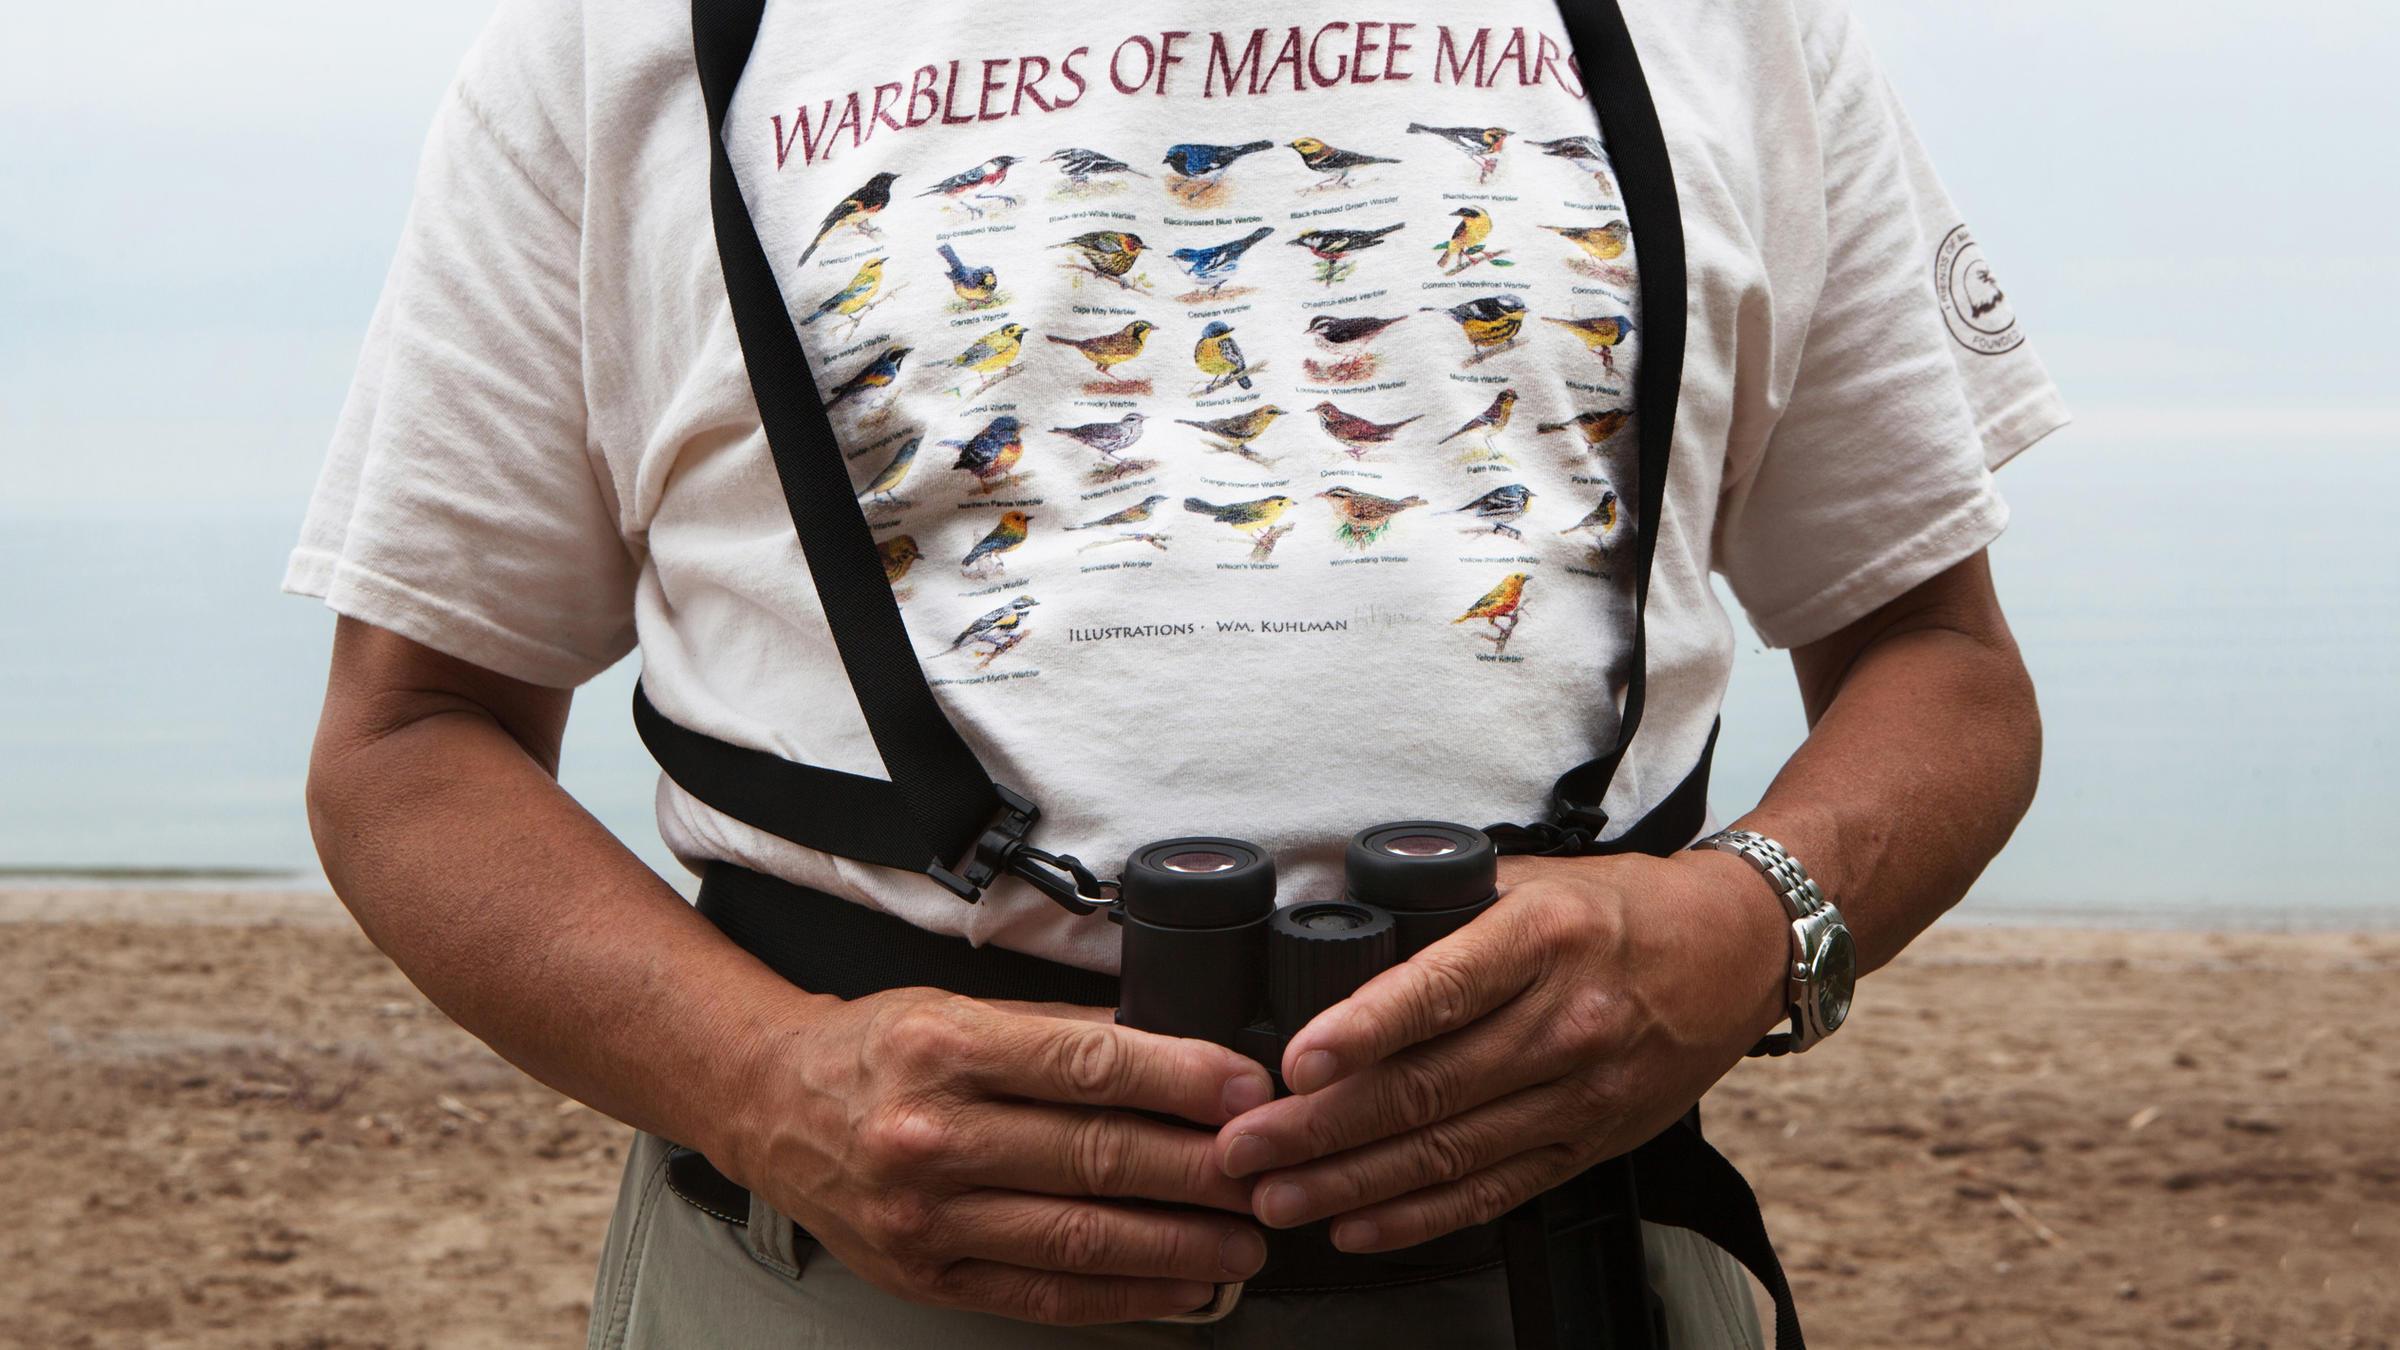 A recurrent festivalgoer sports a vintage Biggest Week shirt. Camilla Cerea/Audubon